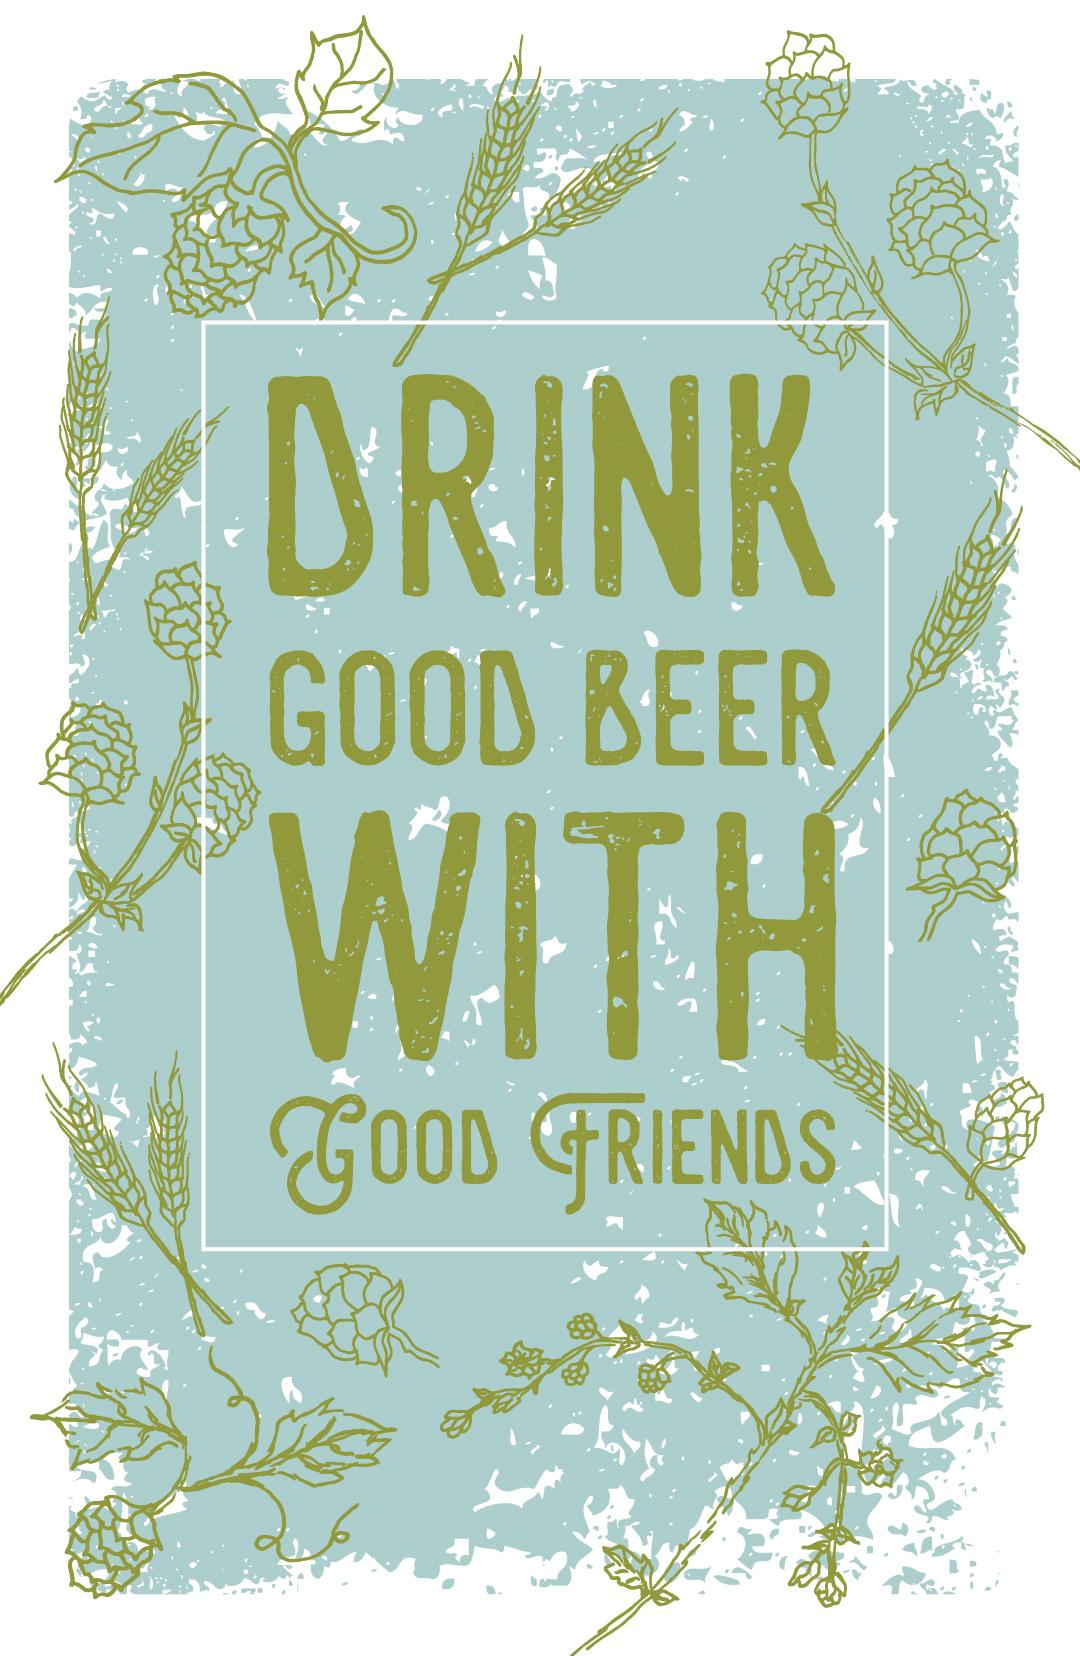 Craft+Beer+Poster-02.jpg